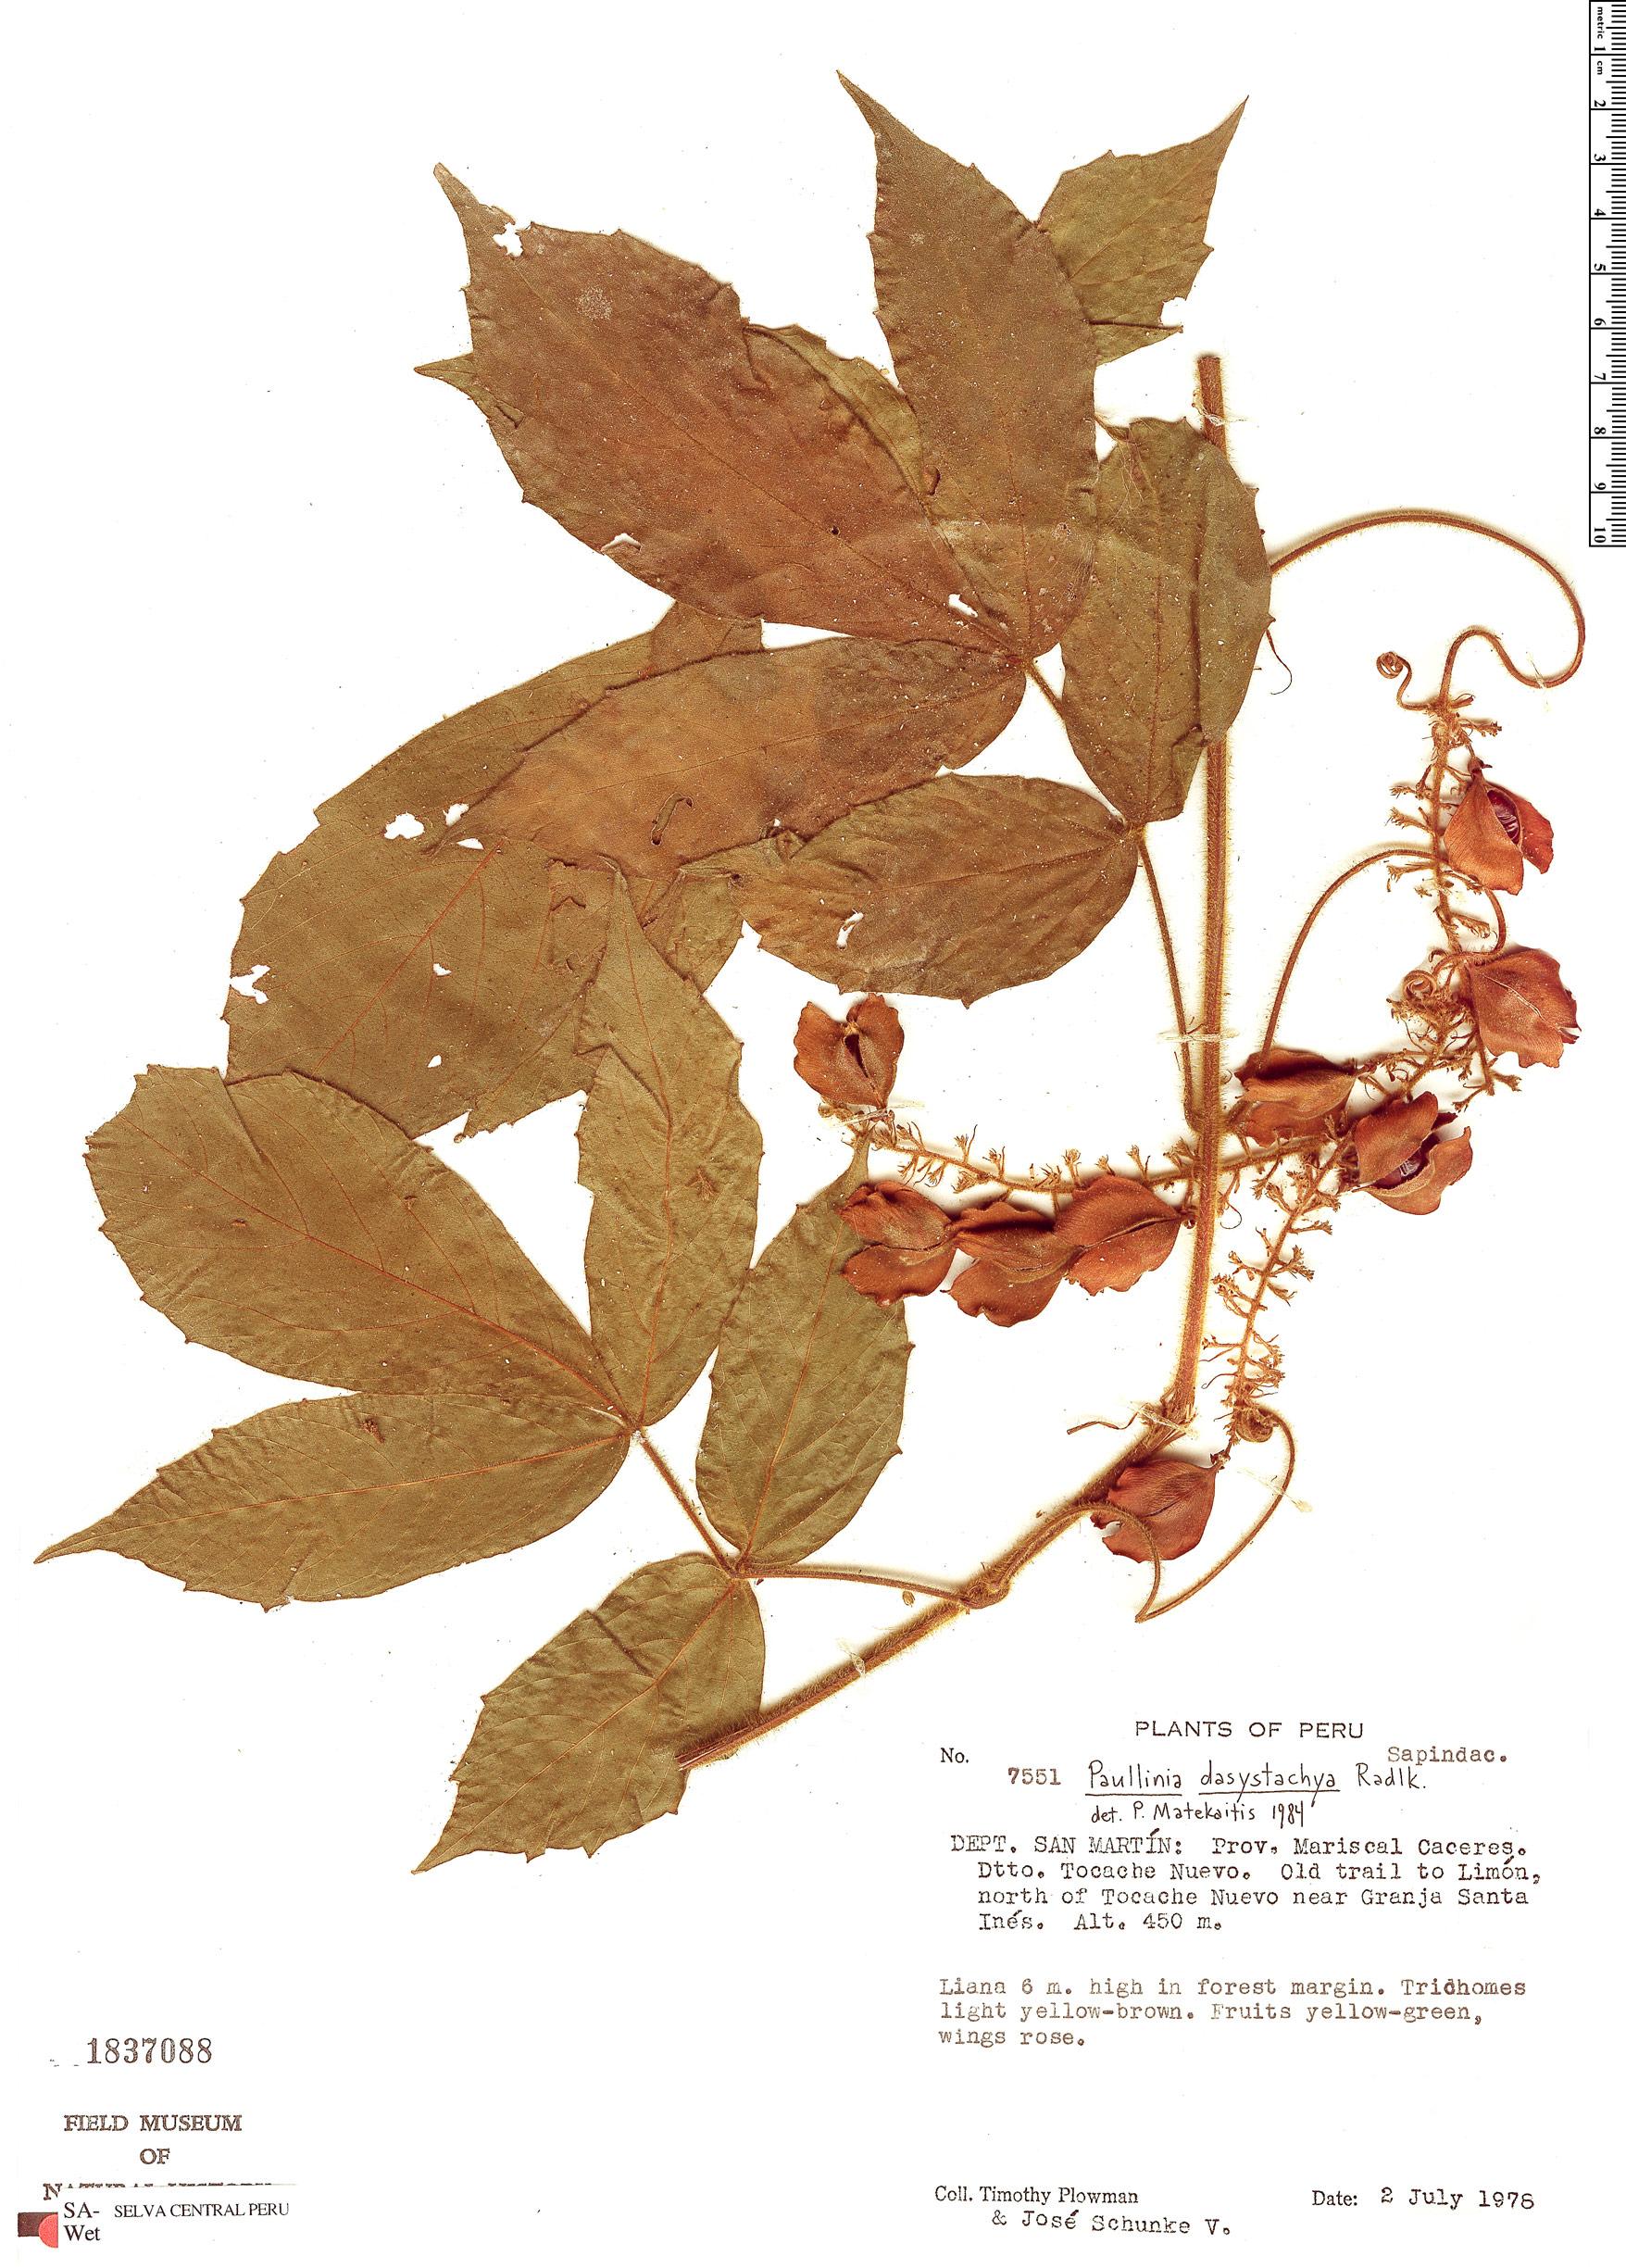 Espécimen: Paullinia dasystachya